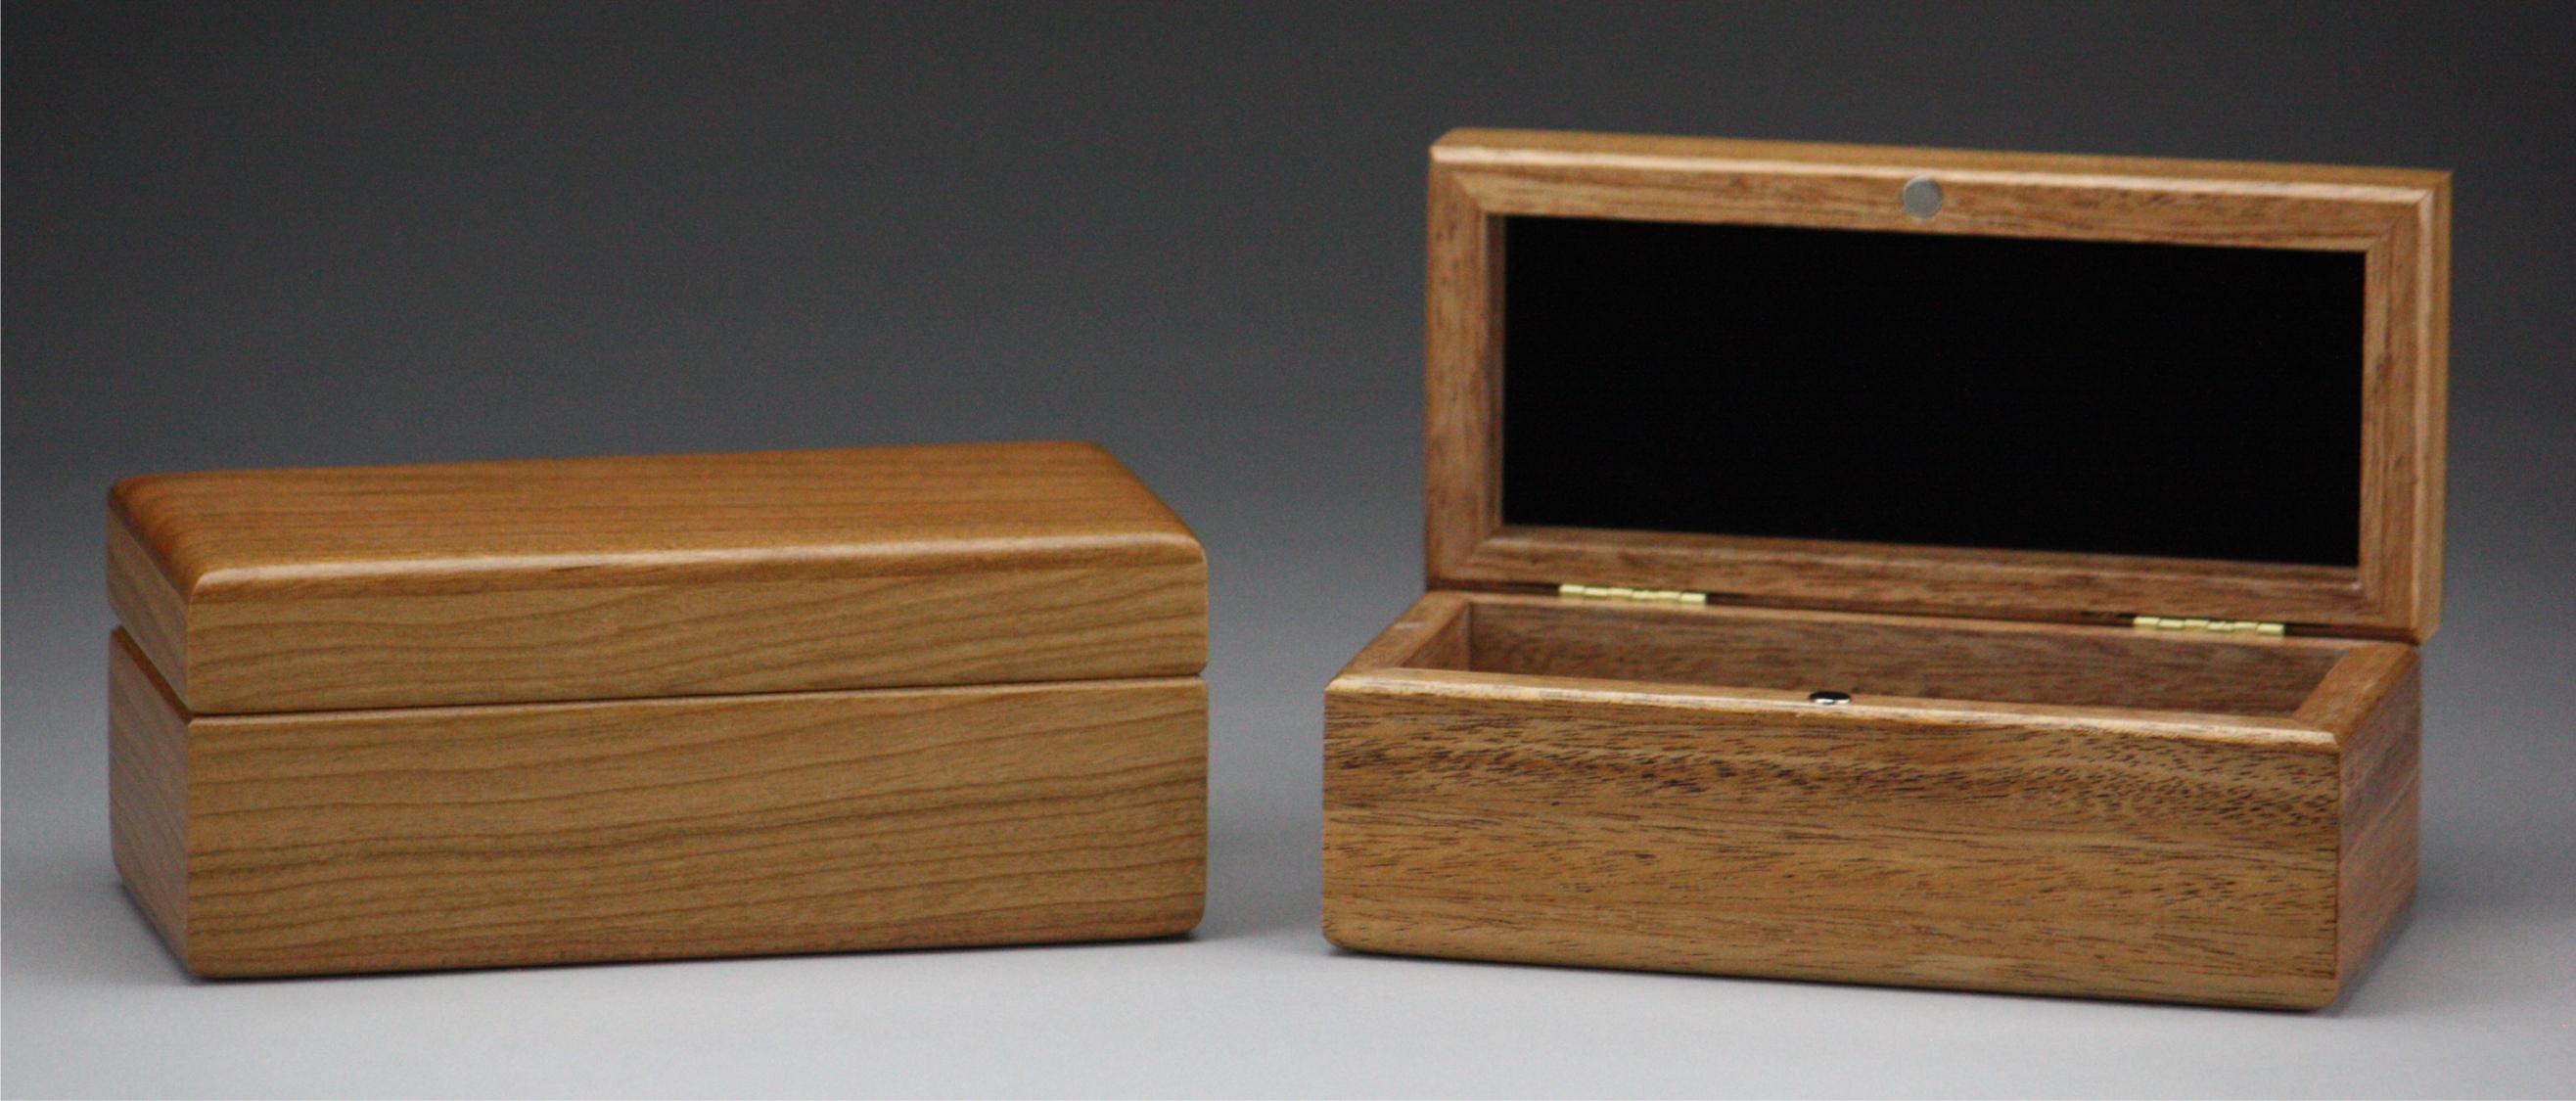 1 sleeve golf ball box 1sgb. Black Bedroom Furniture Sets. Home Design Ideas